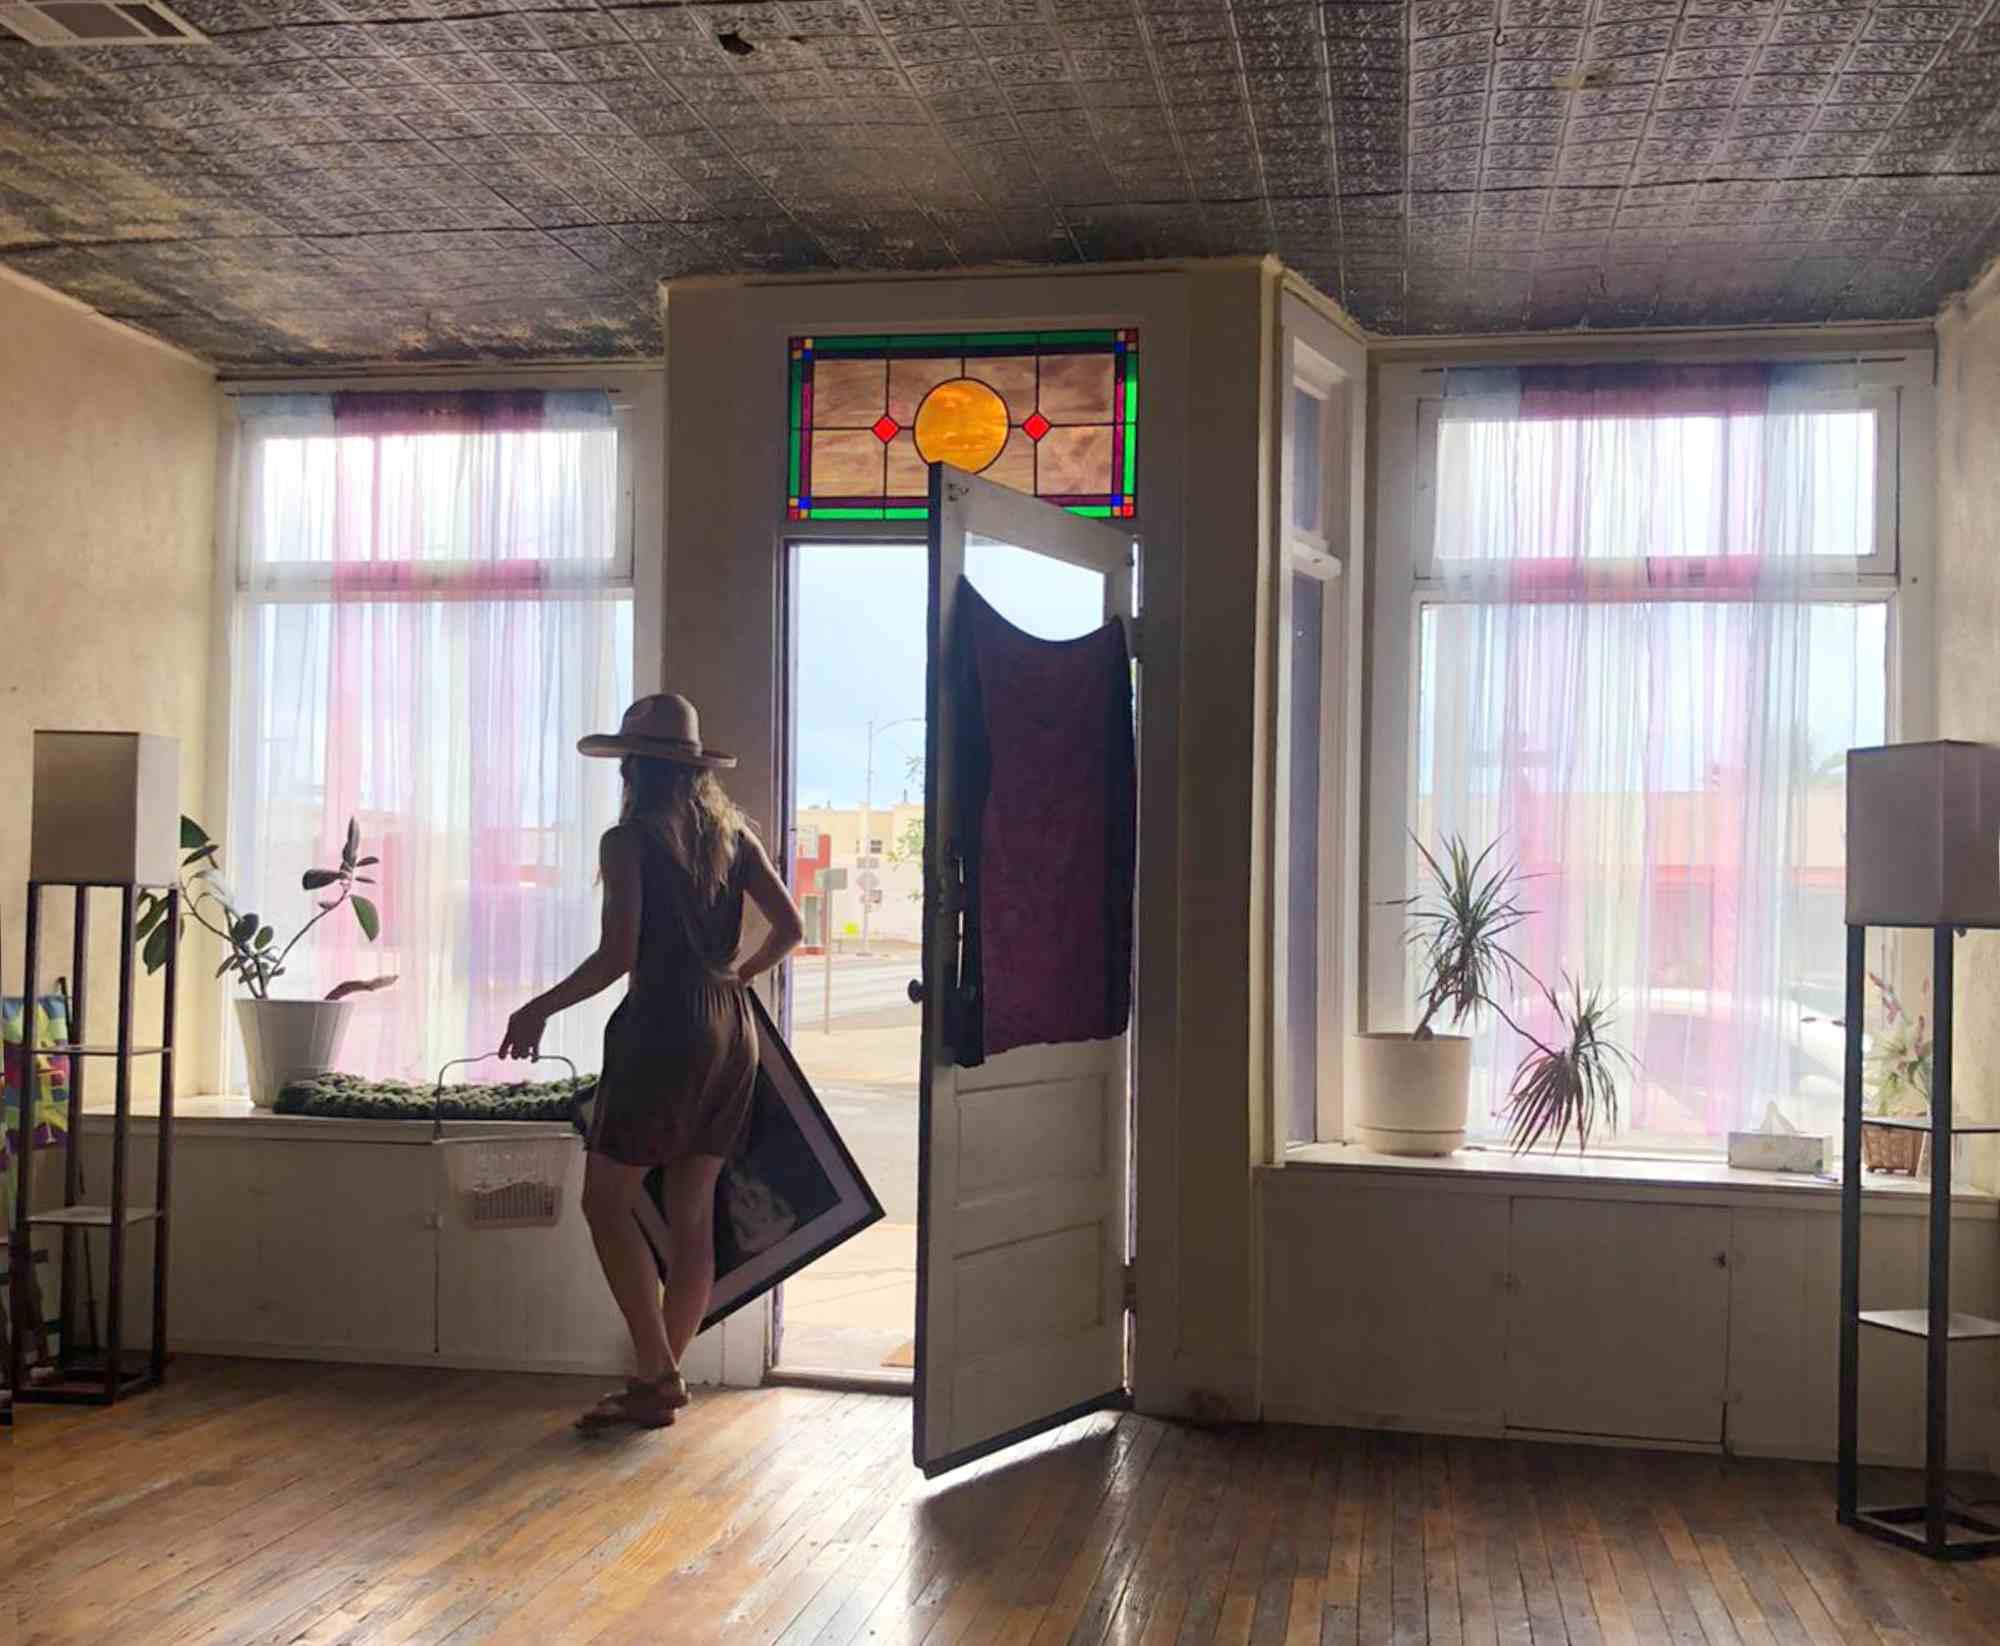 modern dance class taught by Abigail Nance